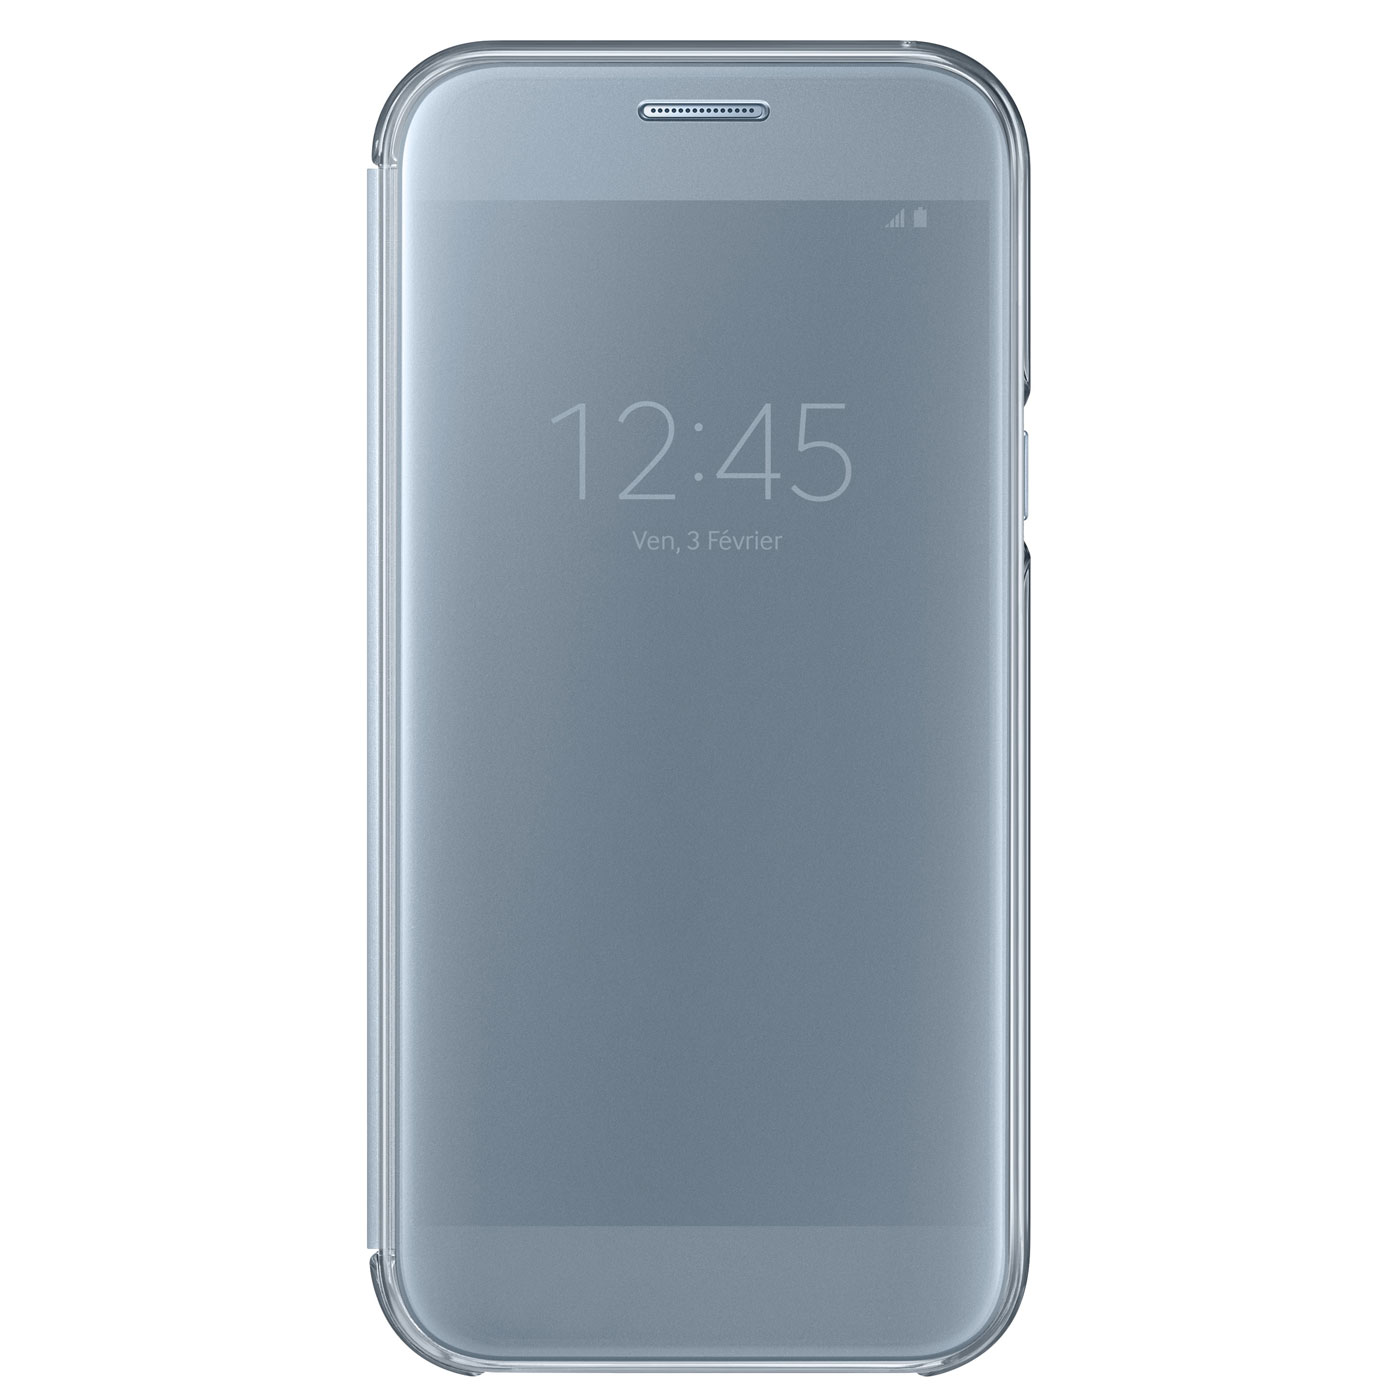 Samsung clear view cover bleu samsung galaxy a5 2017 for Housse samsung a5 2017